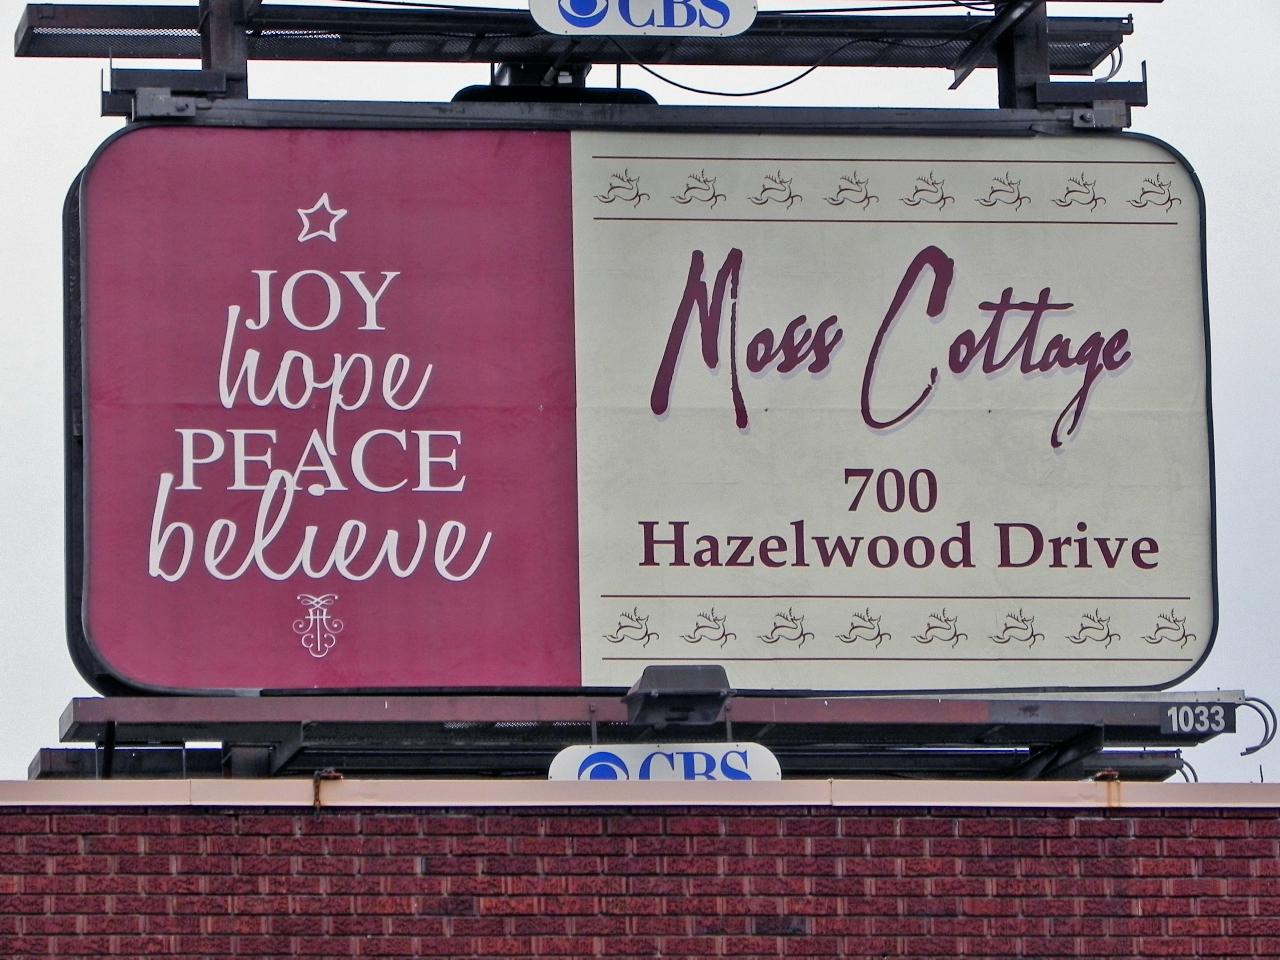 moss-cottage-billboard